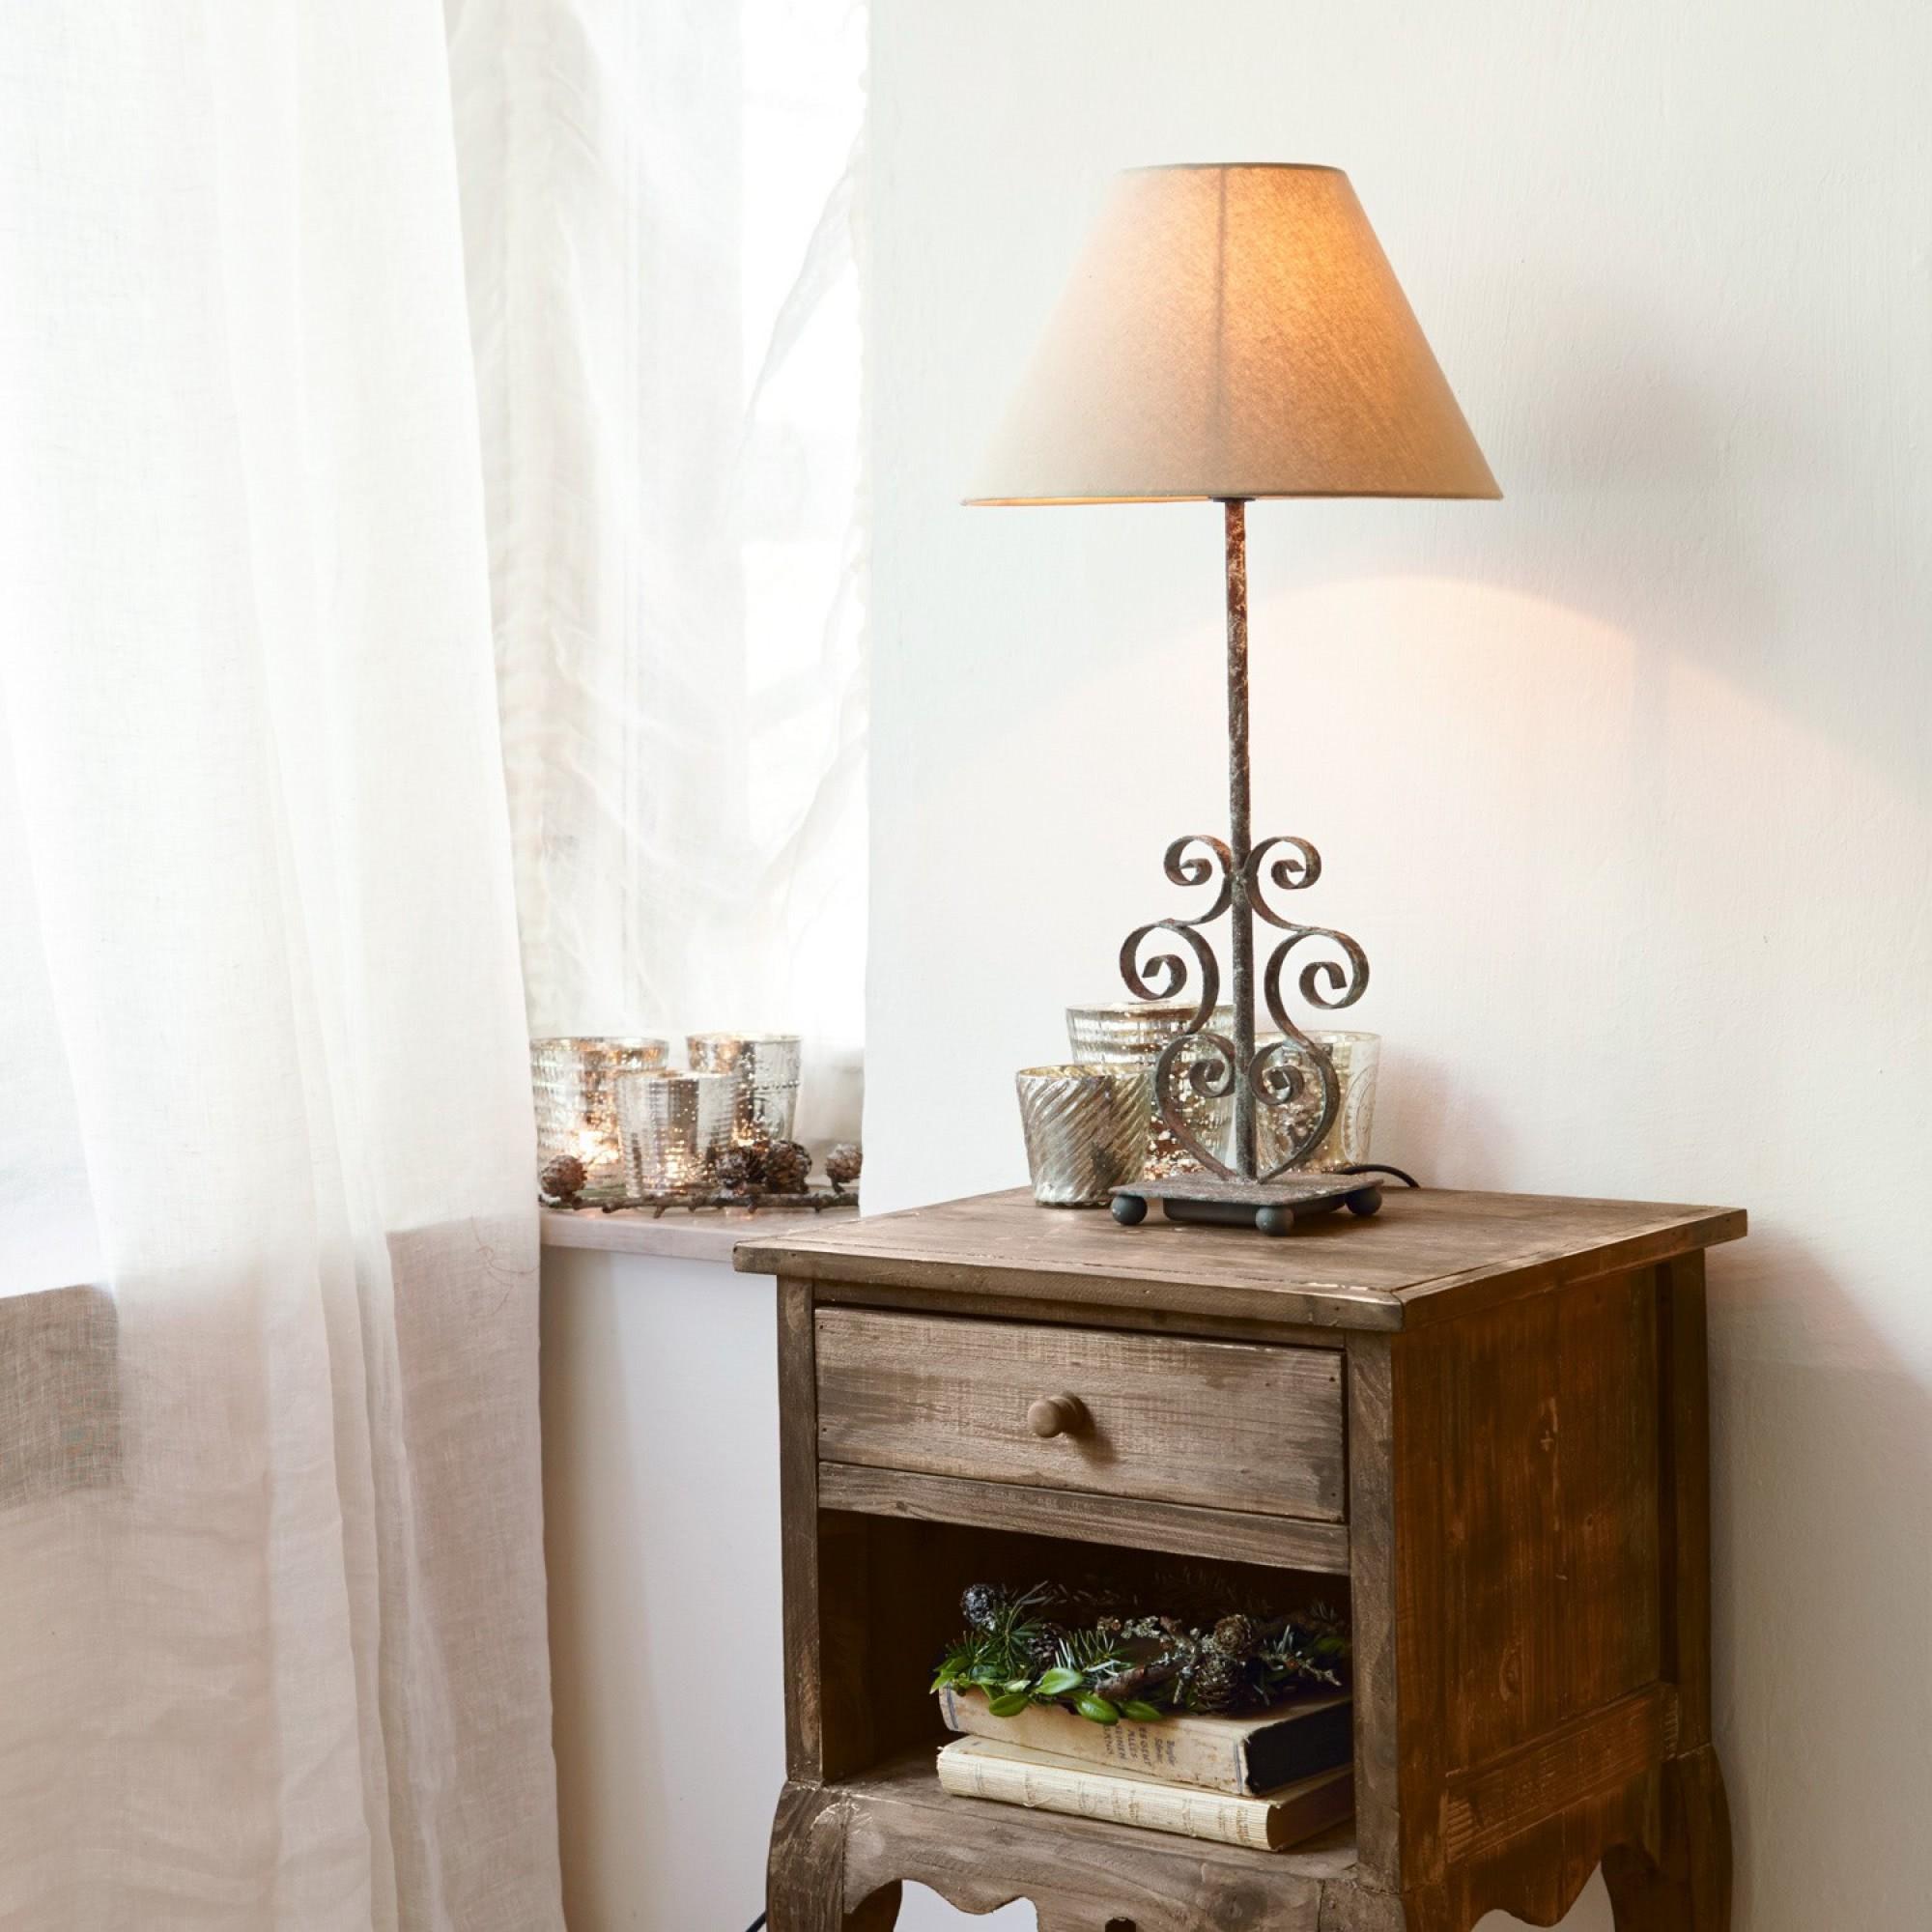 tischlampe clamart loberon coming home. Black Bedroom Furniture Sets. Home Design Ideas